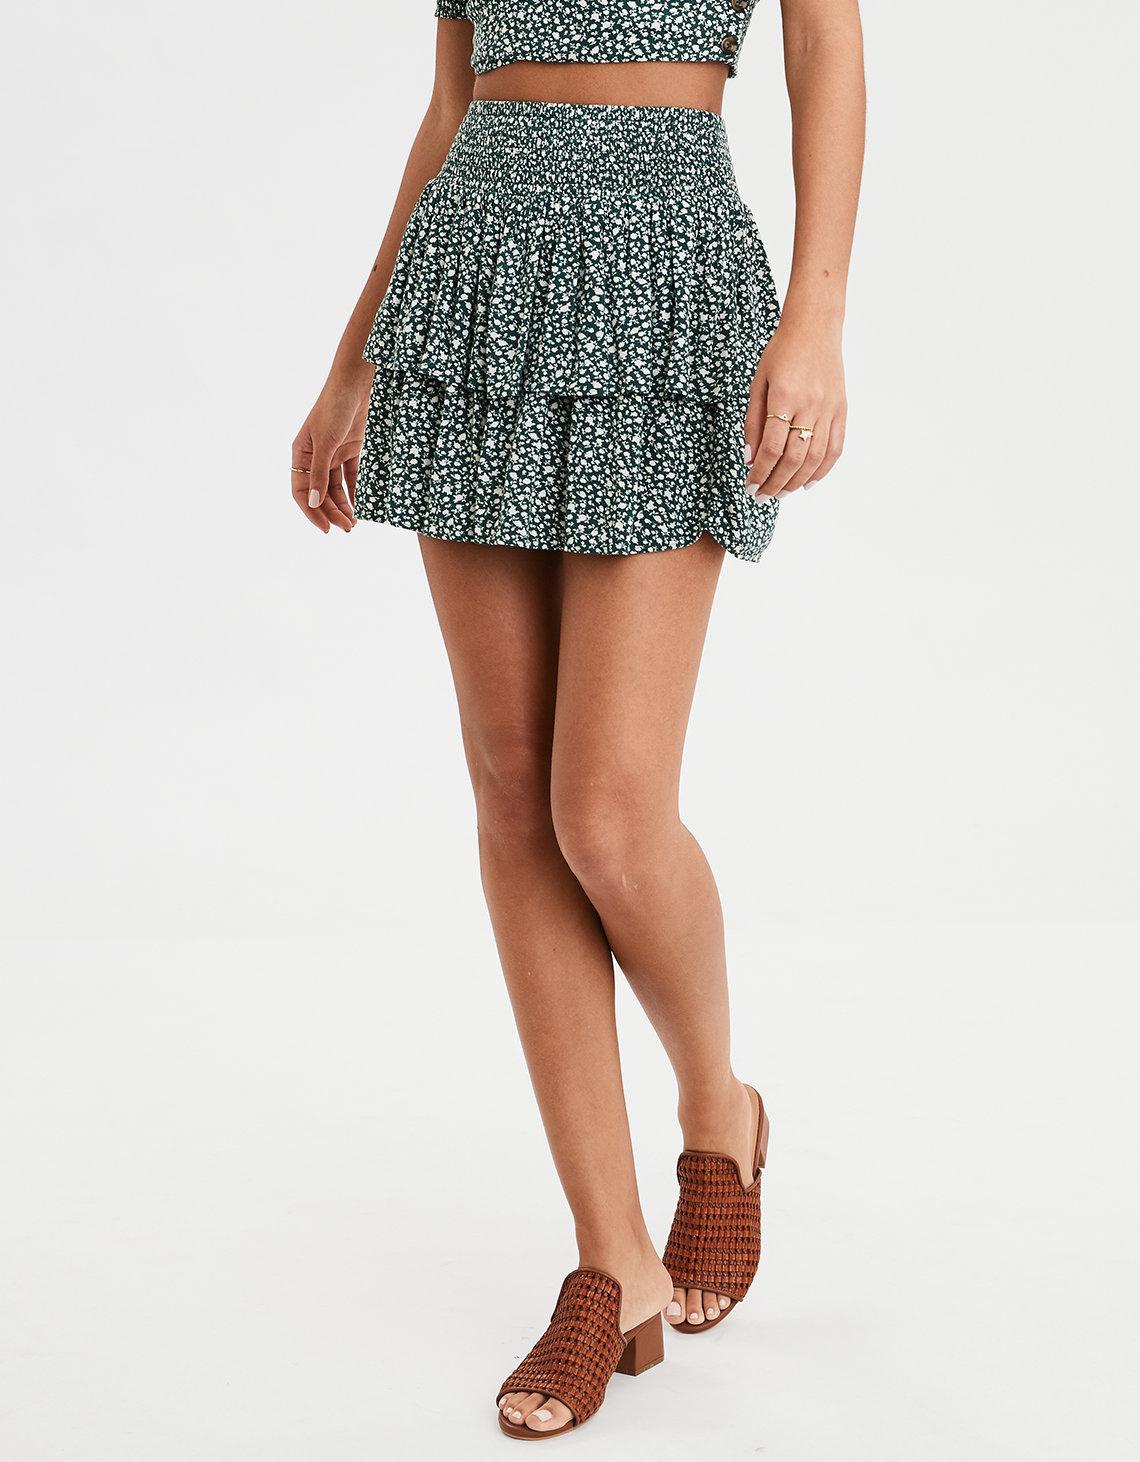 b86f414b43 American Eagle Ae High-waisted Floral Mini Skirt in Green - Lyst